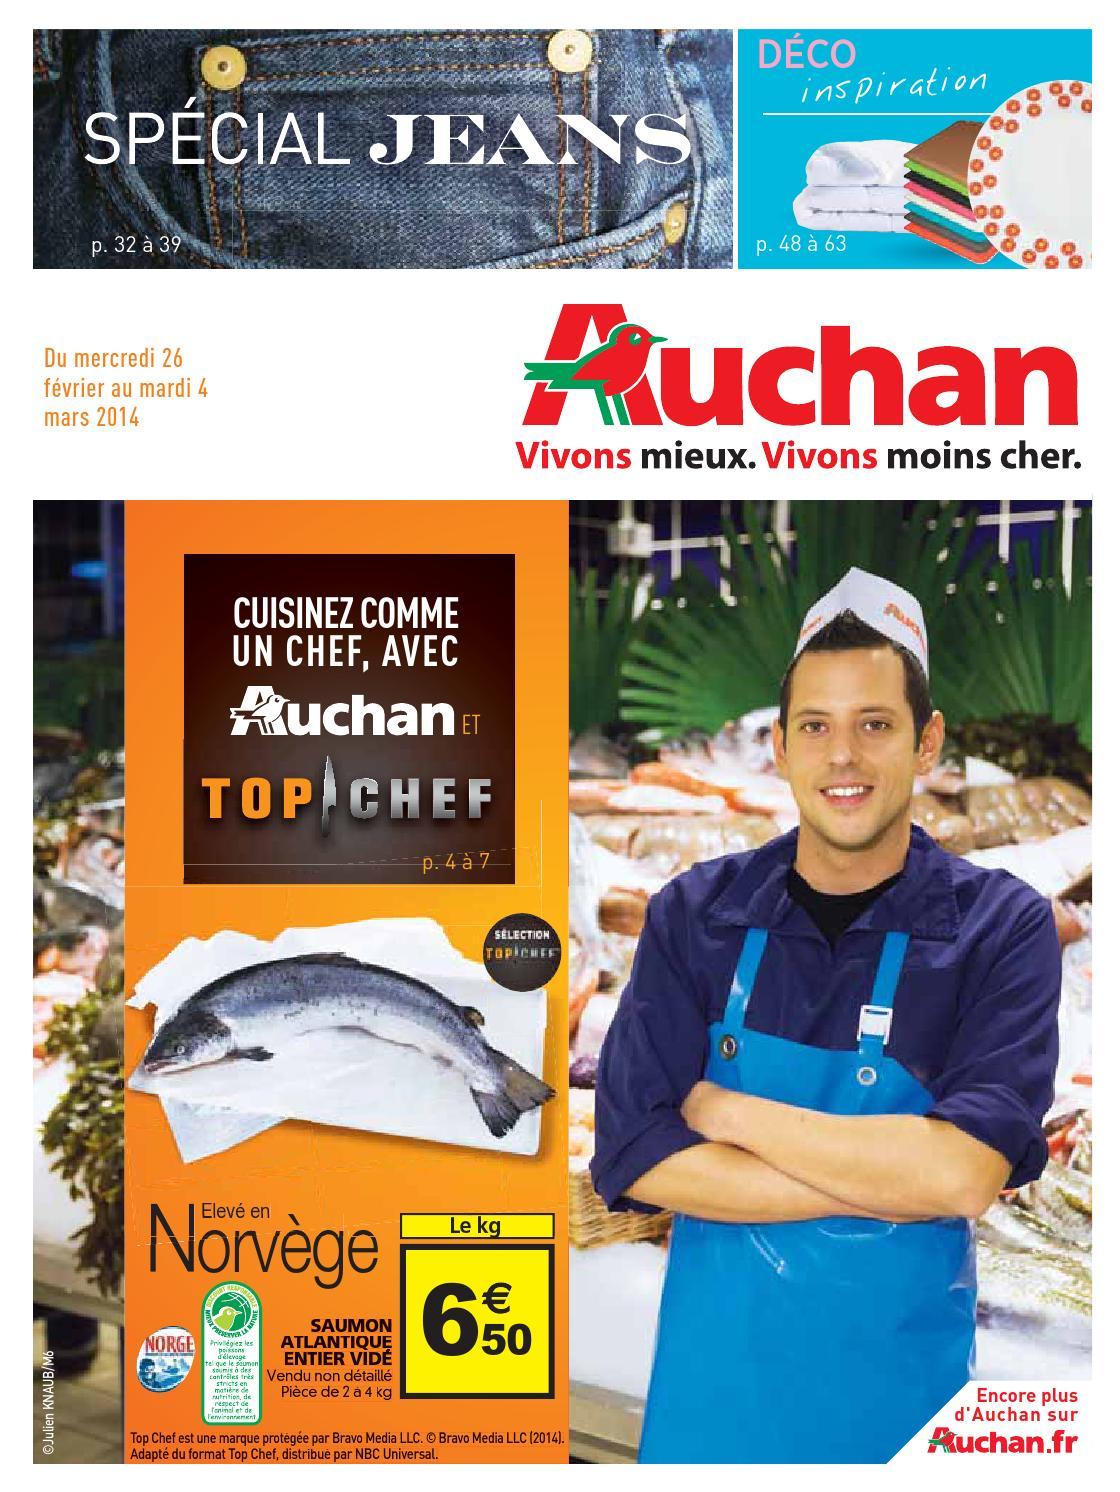 Auchan 2014 02 03 Monroe 26 Issuu By 4 Joe Catalogue m8wN0Ovn